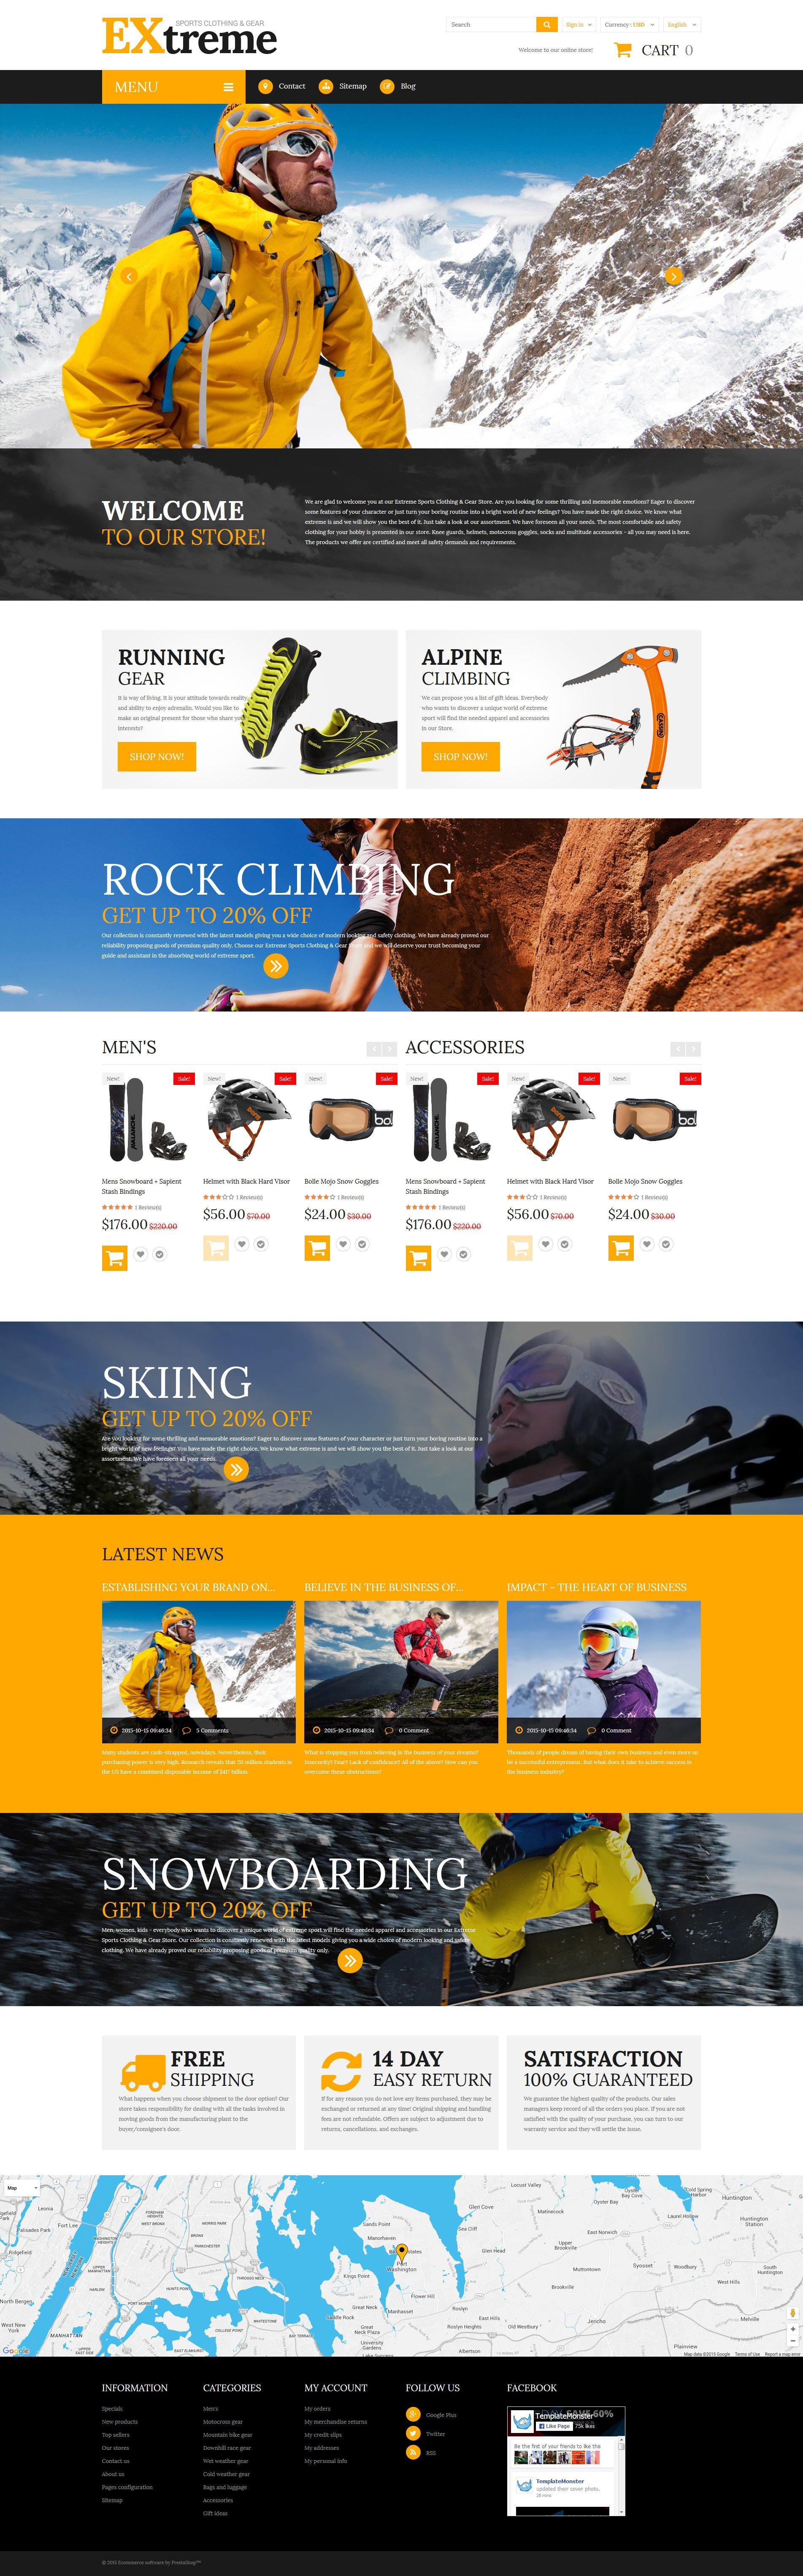 Extreme Sports Clothing PrestaShop Theme